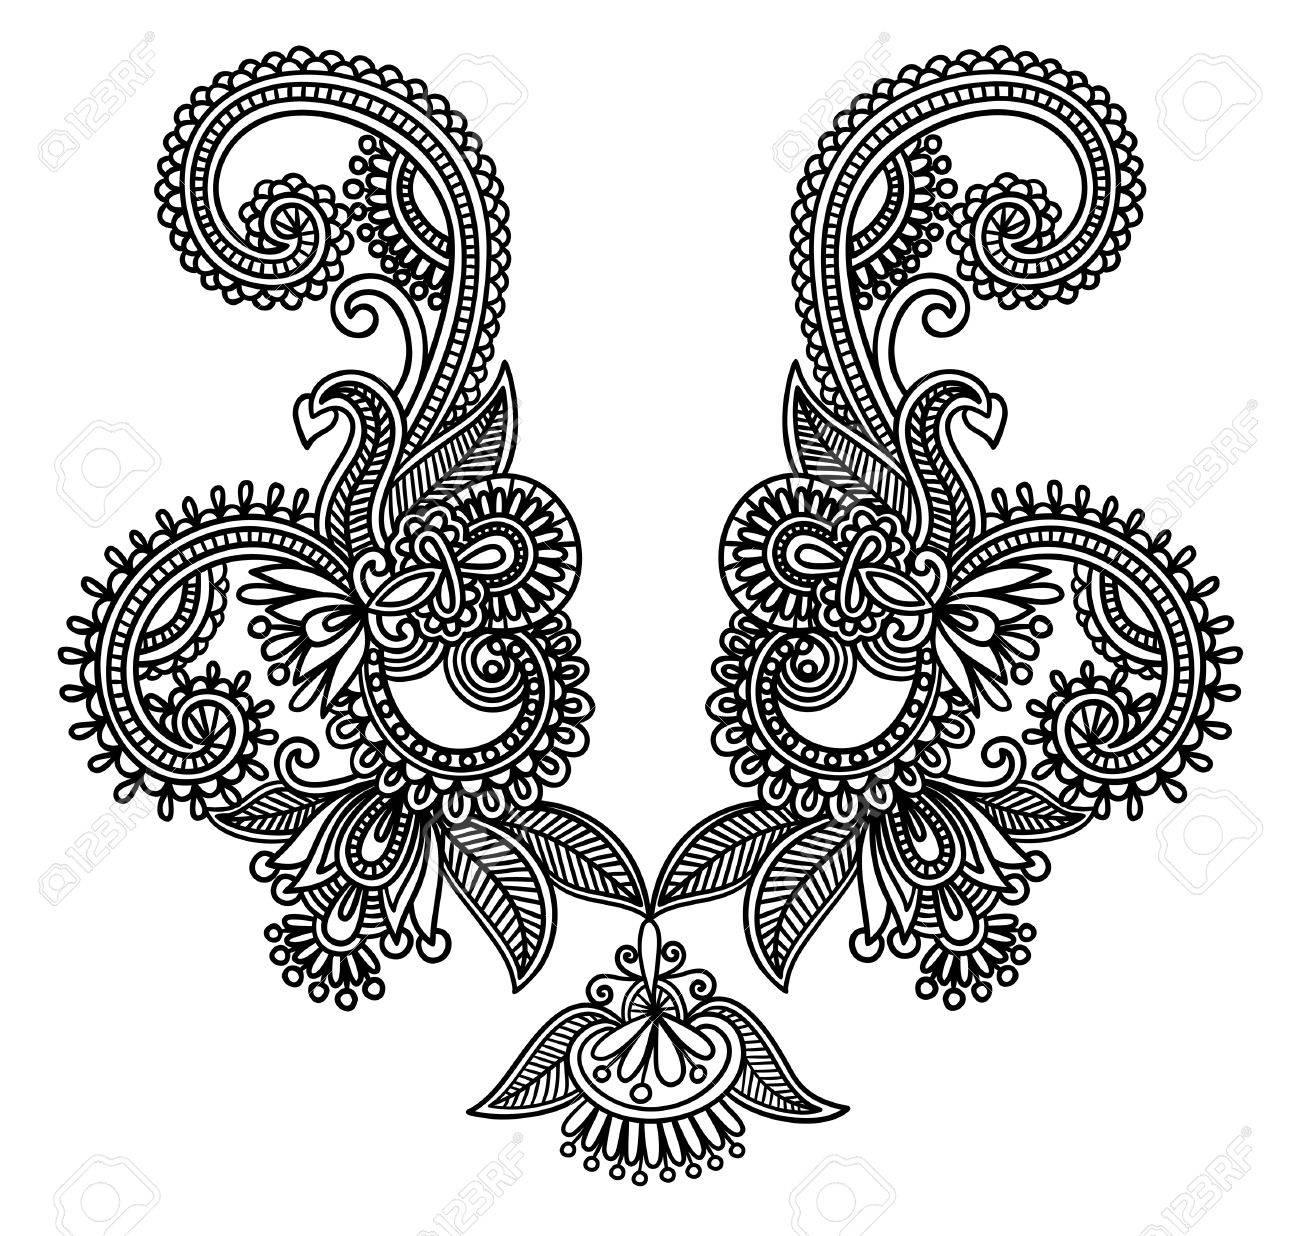 Neckline embroidery fashion Stock Vector - 11189220